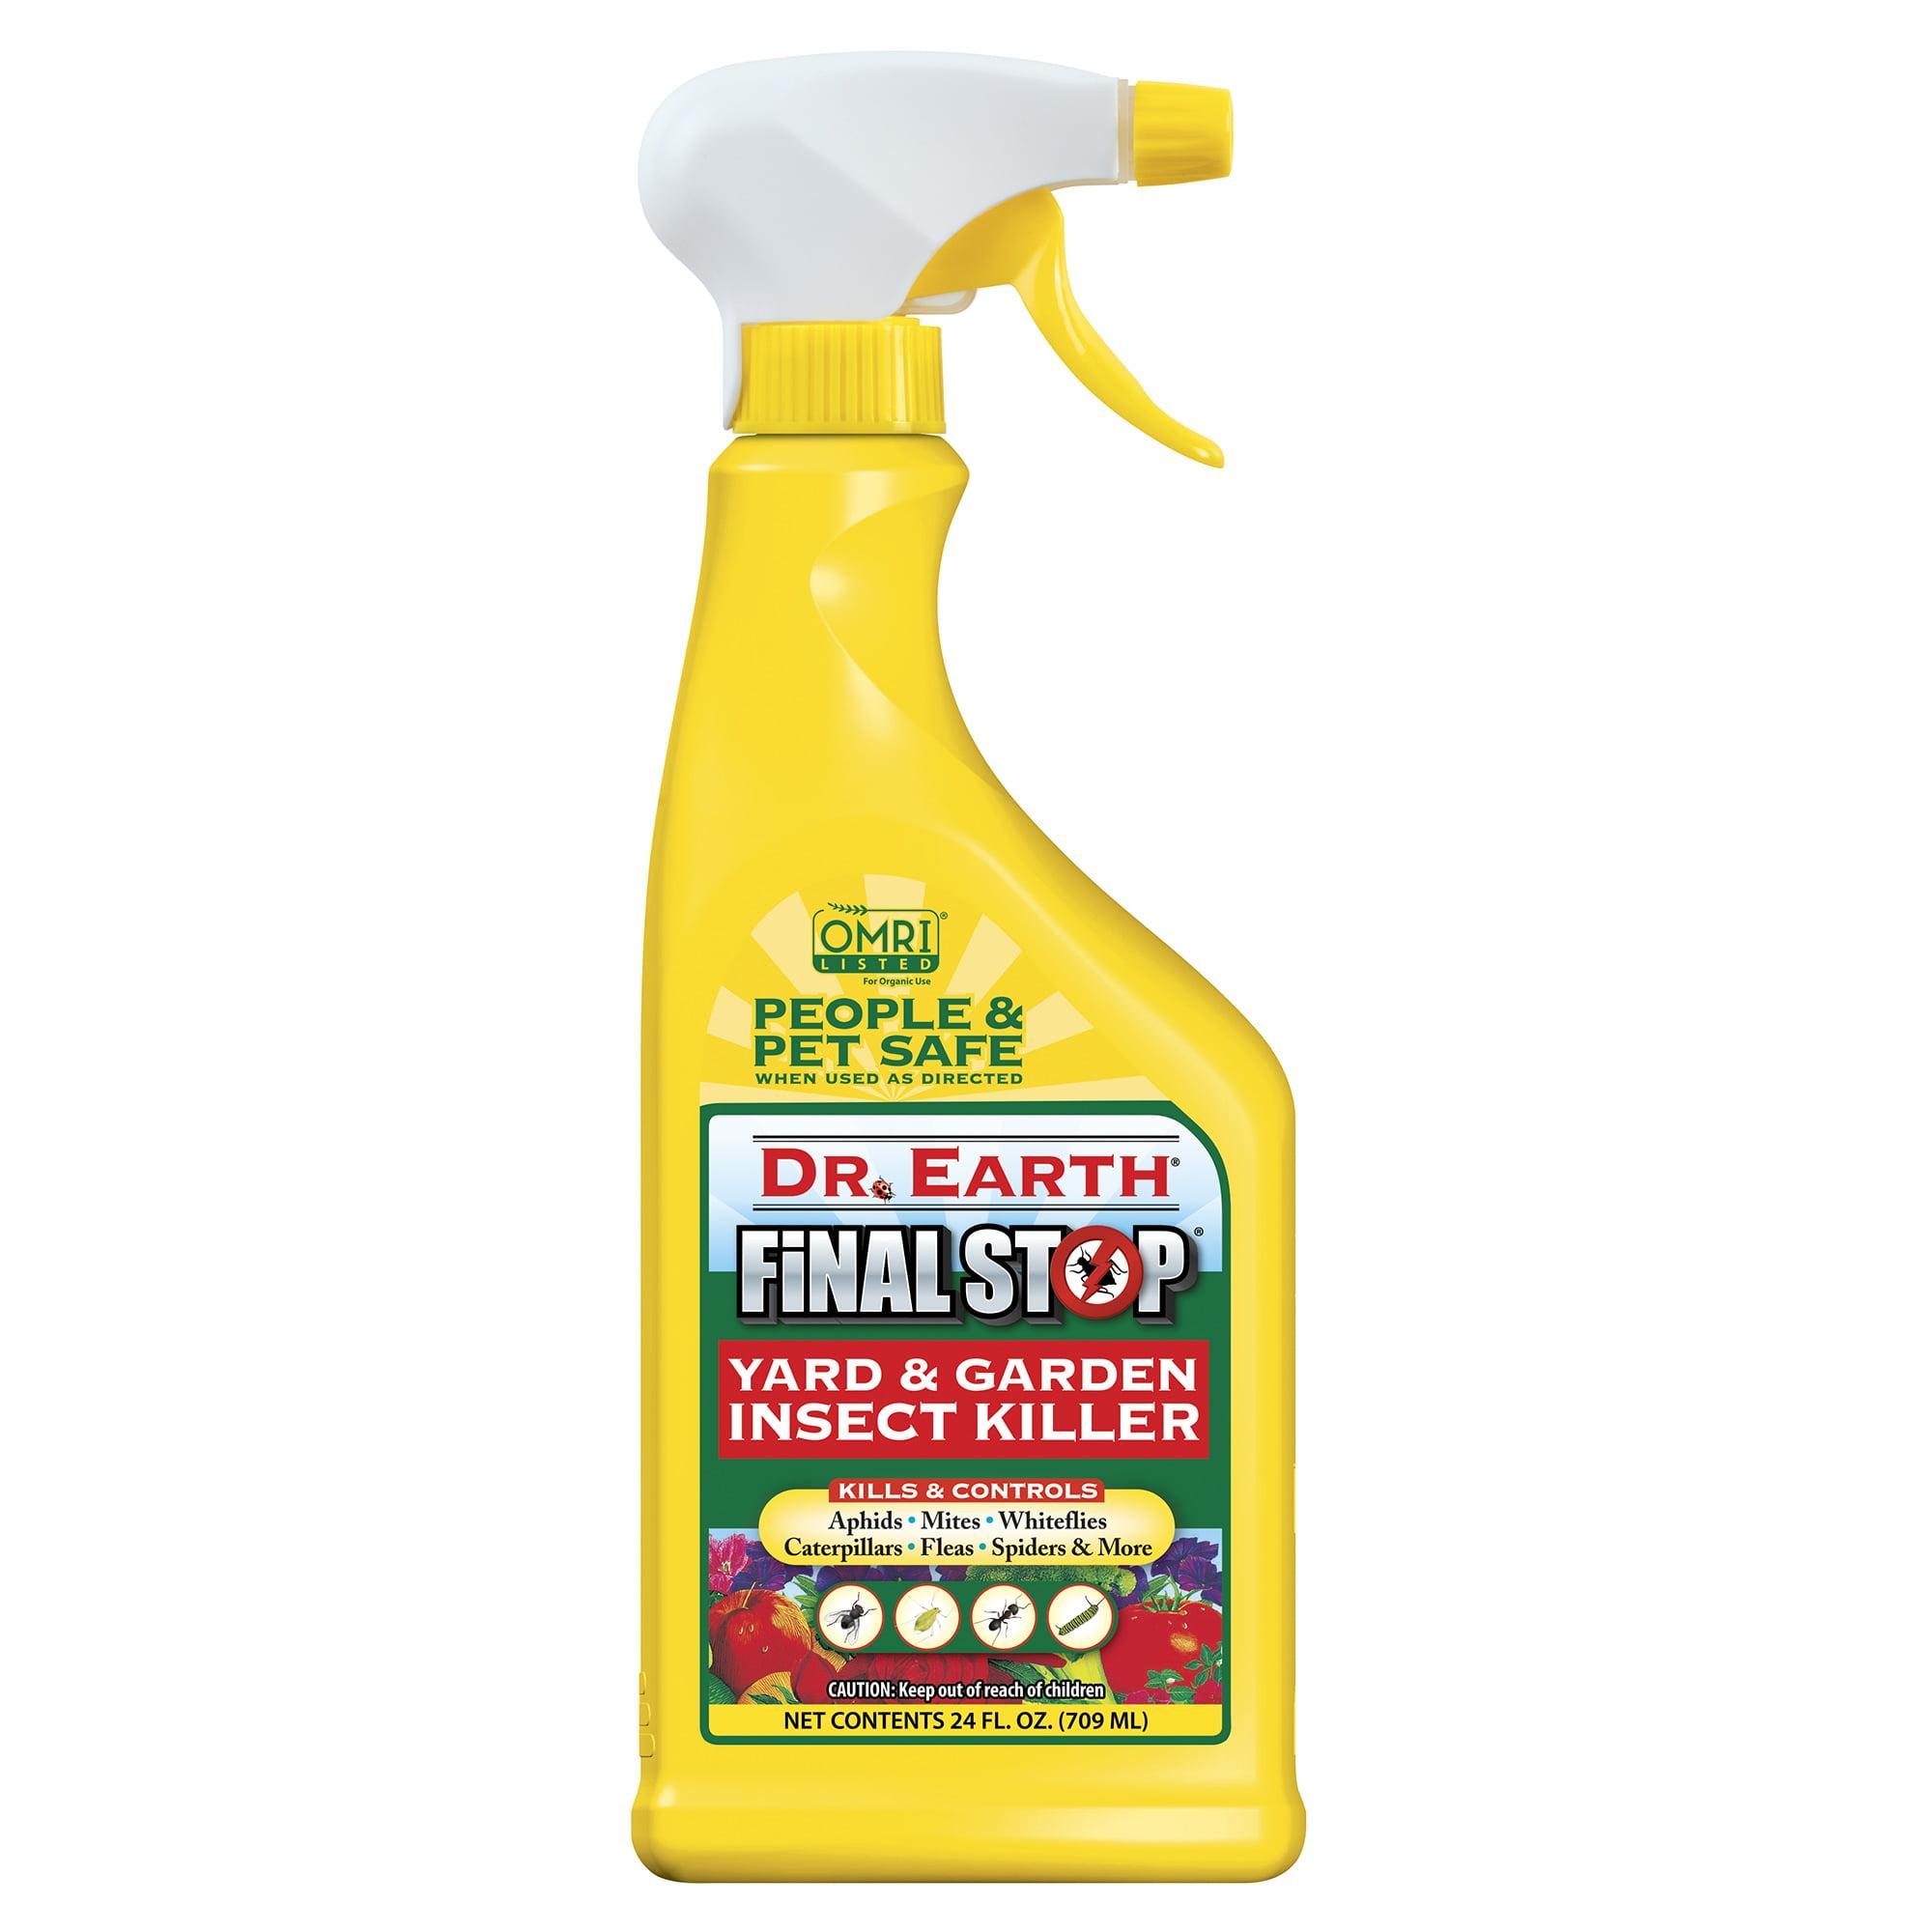 Dr. Earth Organic & Natural Final Stop Yard & Garden Insect Killer, 24 oz RTU